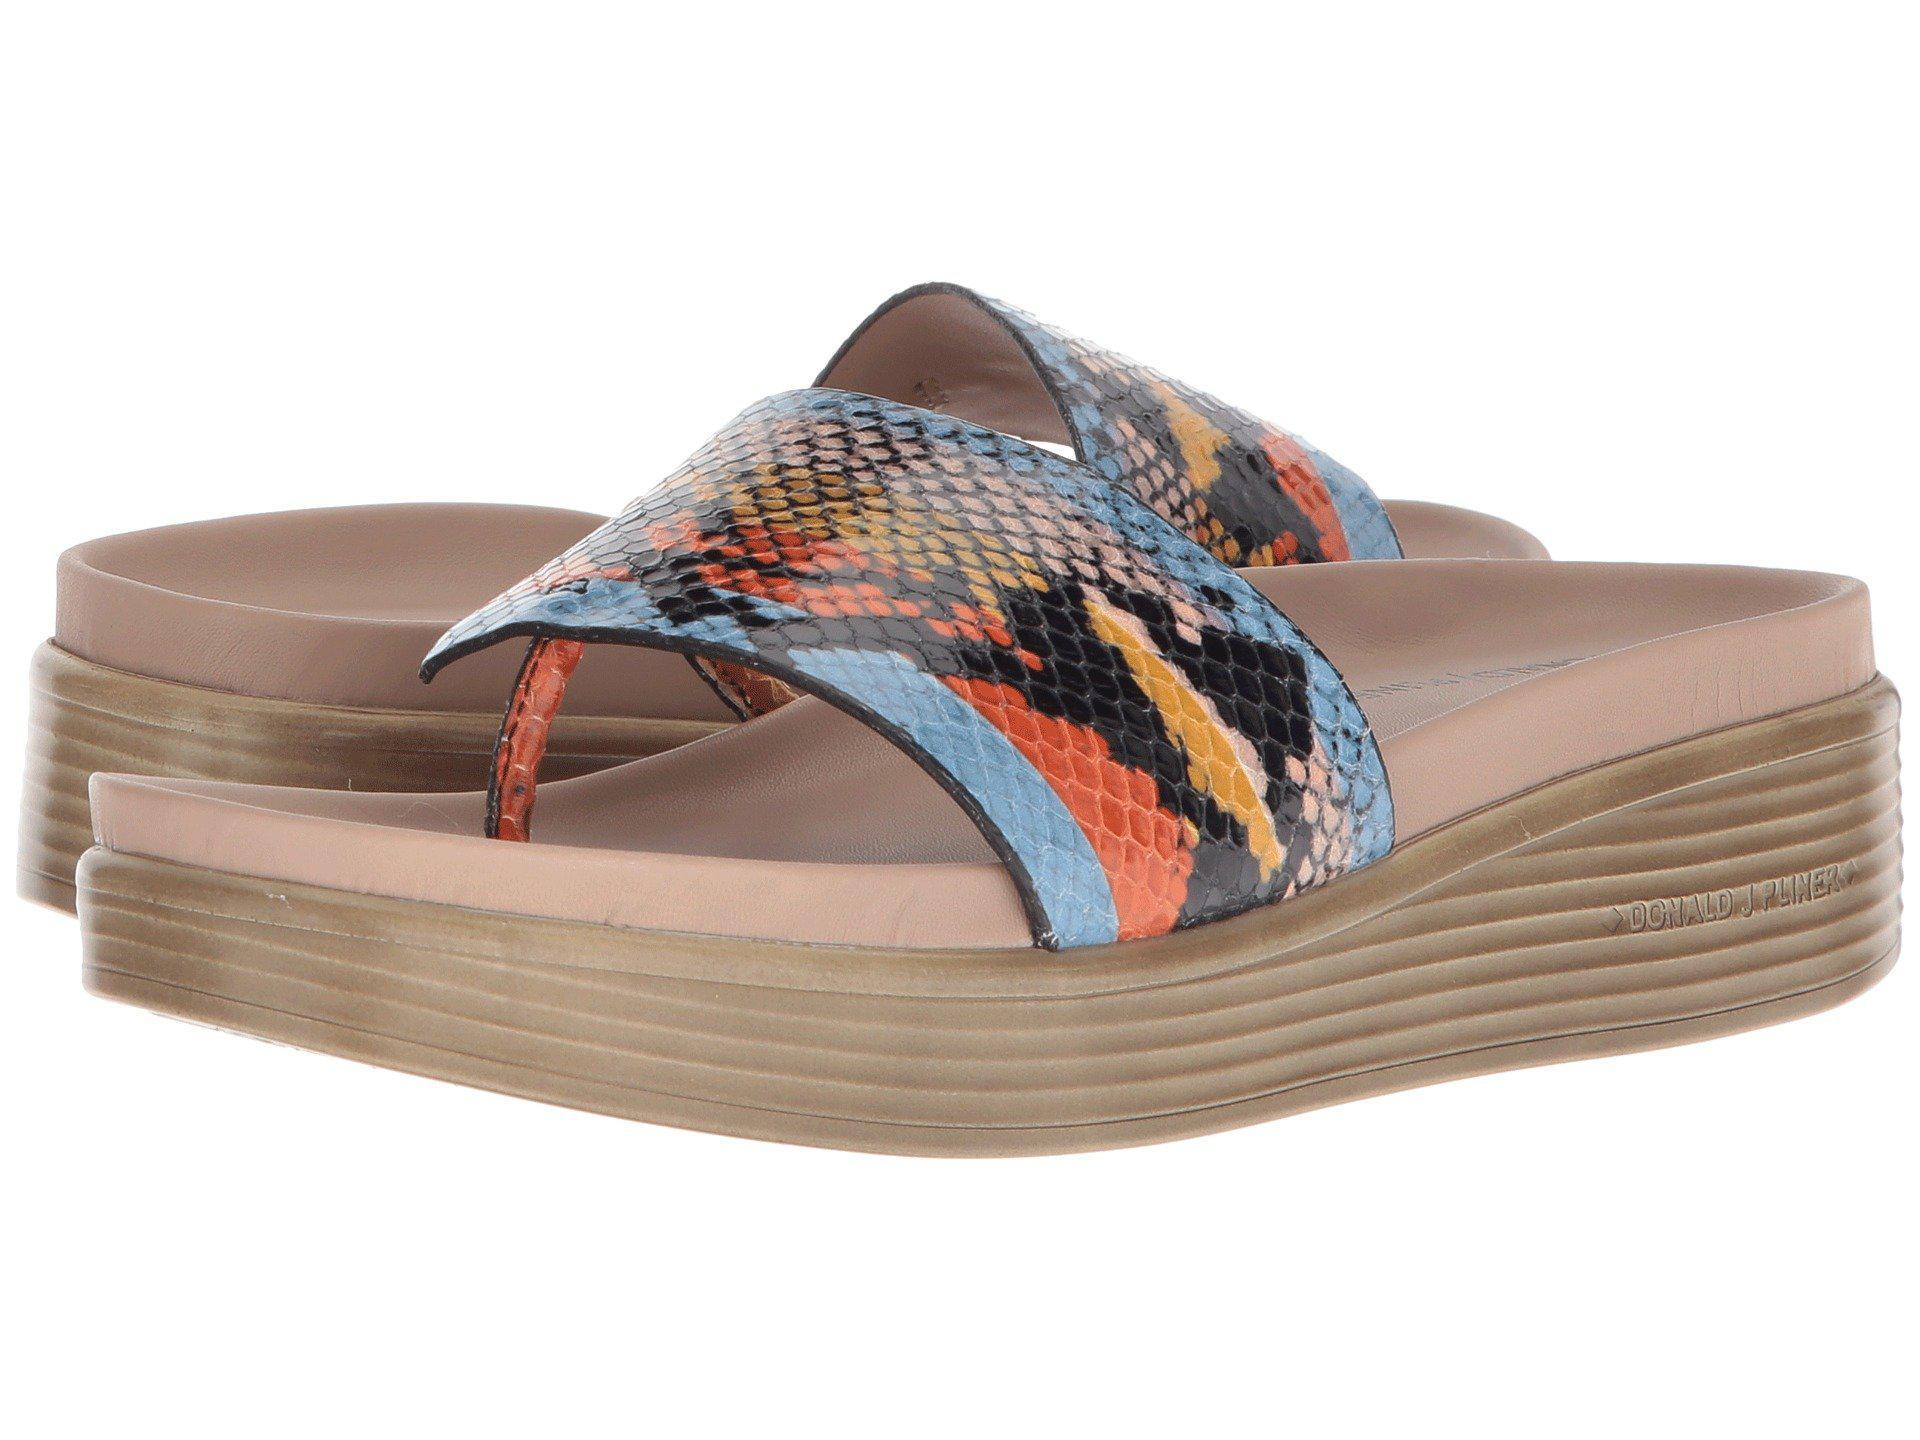 06ffd8d6397a Lyst - Donald J Pliner Fifi 19 (rose Gold) Women s Wedge Shoes